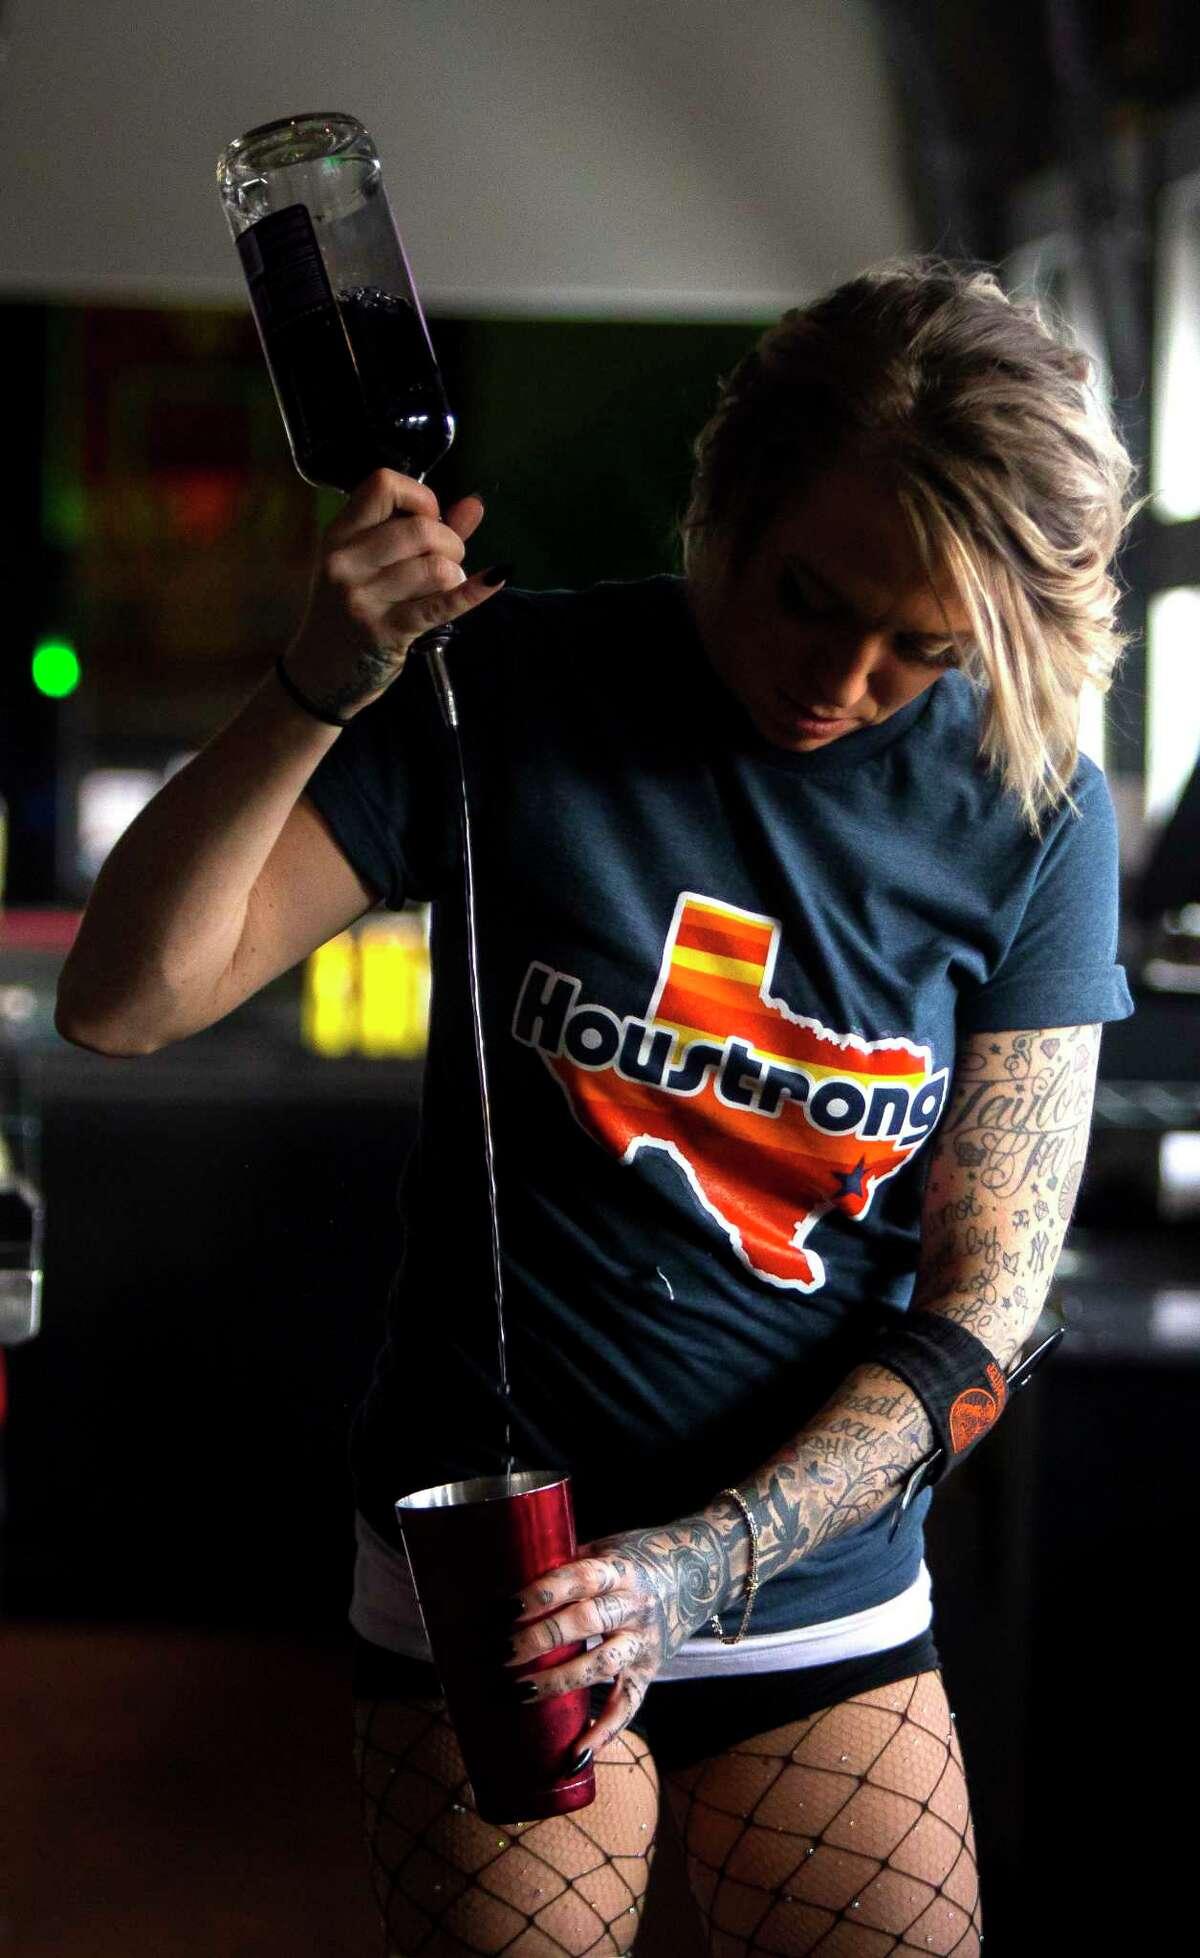 Chelsea Klinton pours a drink at The Pub Galleria on Richmond on Saturday, Nov. 4, 2013. (Annie Mulligan / Freelance)